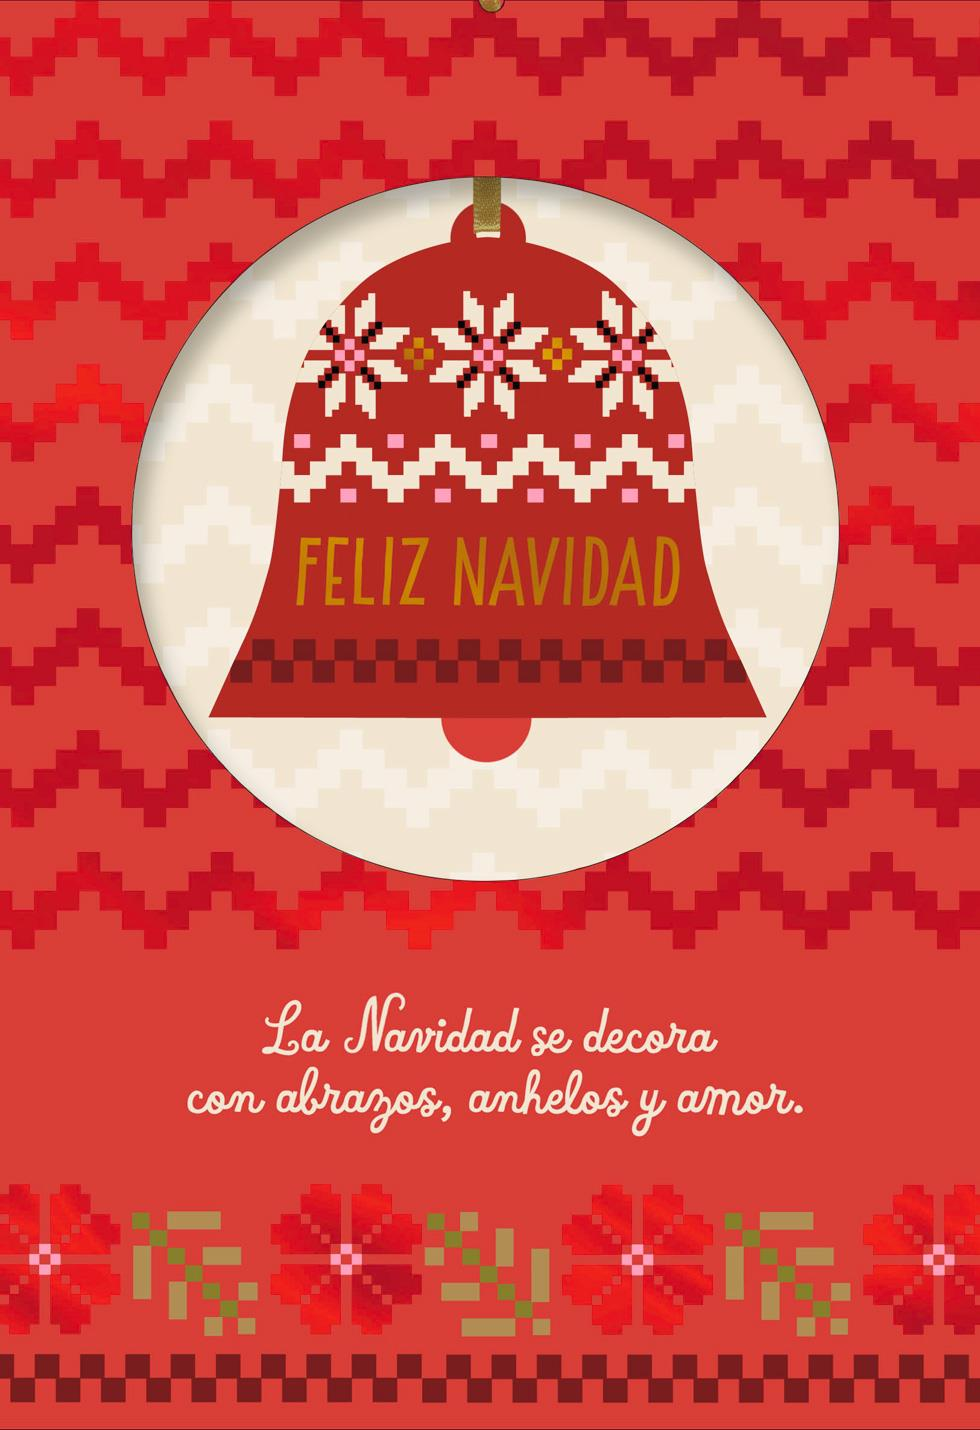 Peace And Joy Spanish Language Christmas Card With